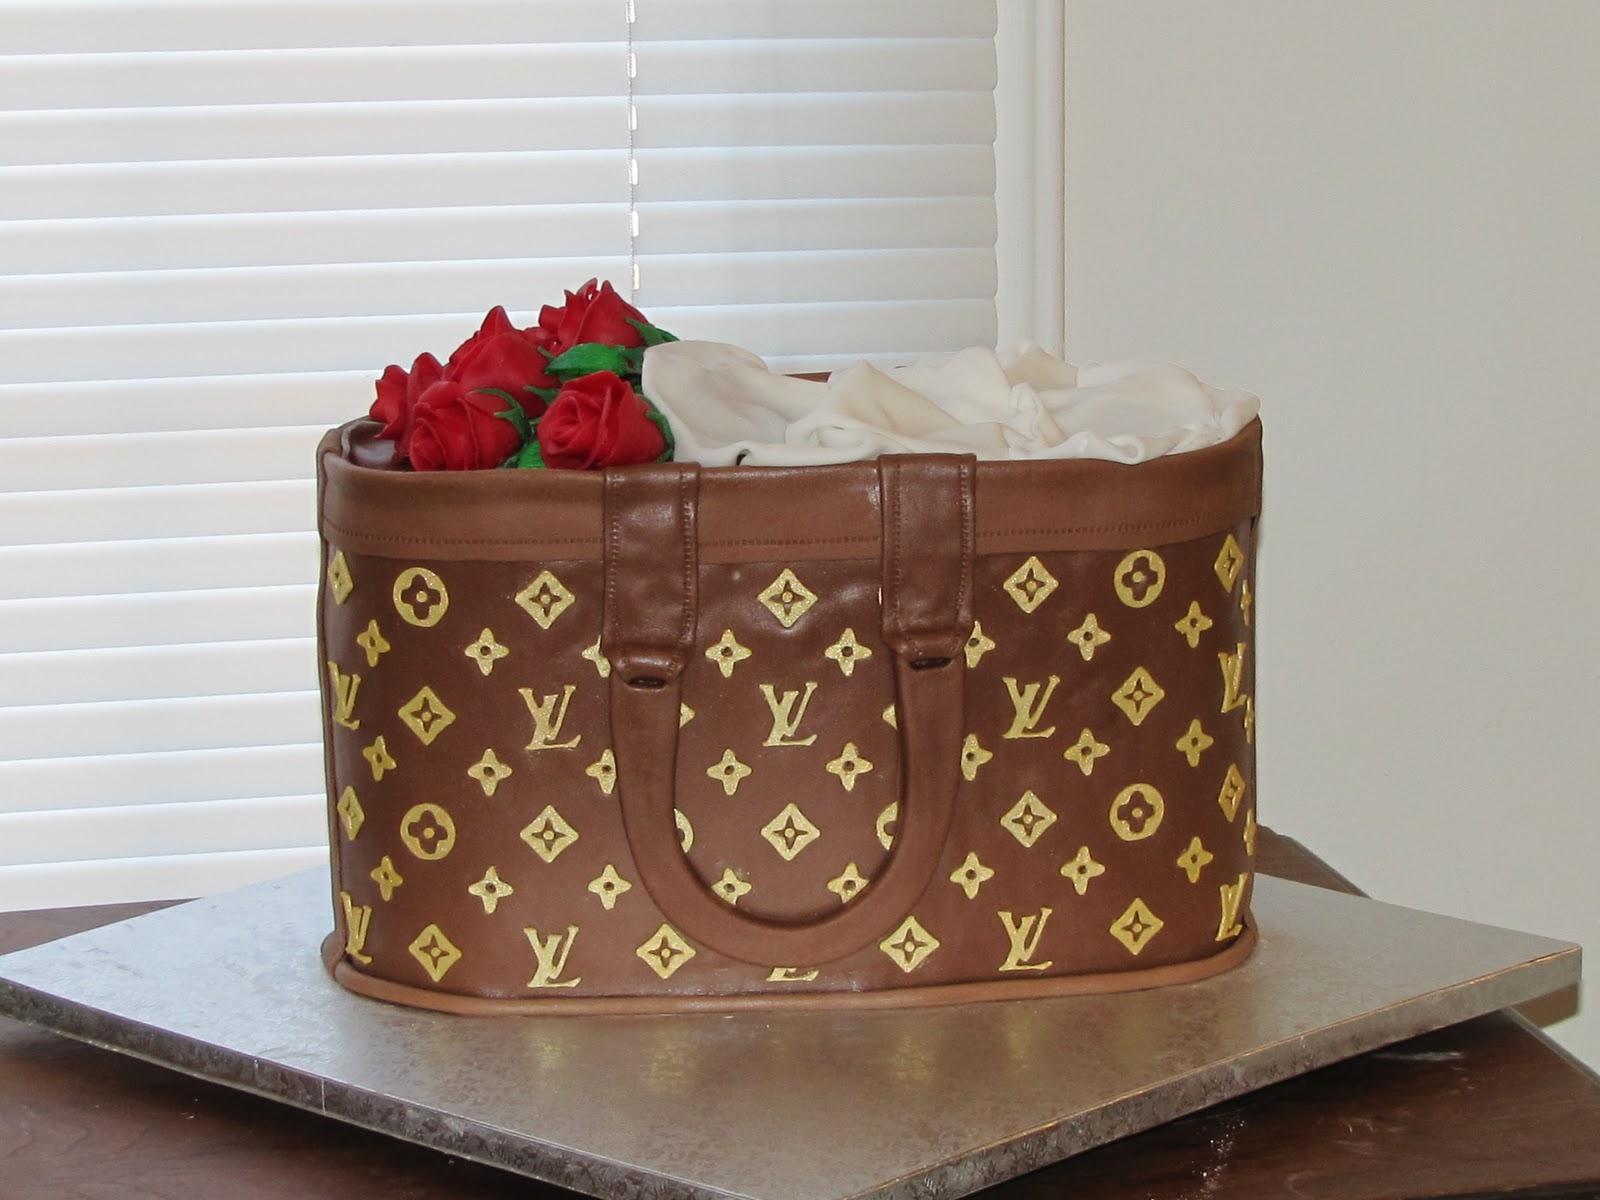 designer-bags-lv-gucci-prada-cakes-cupcakes-14